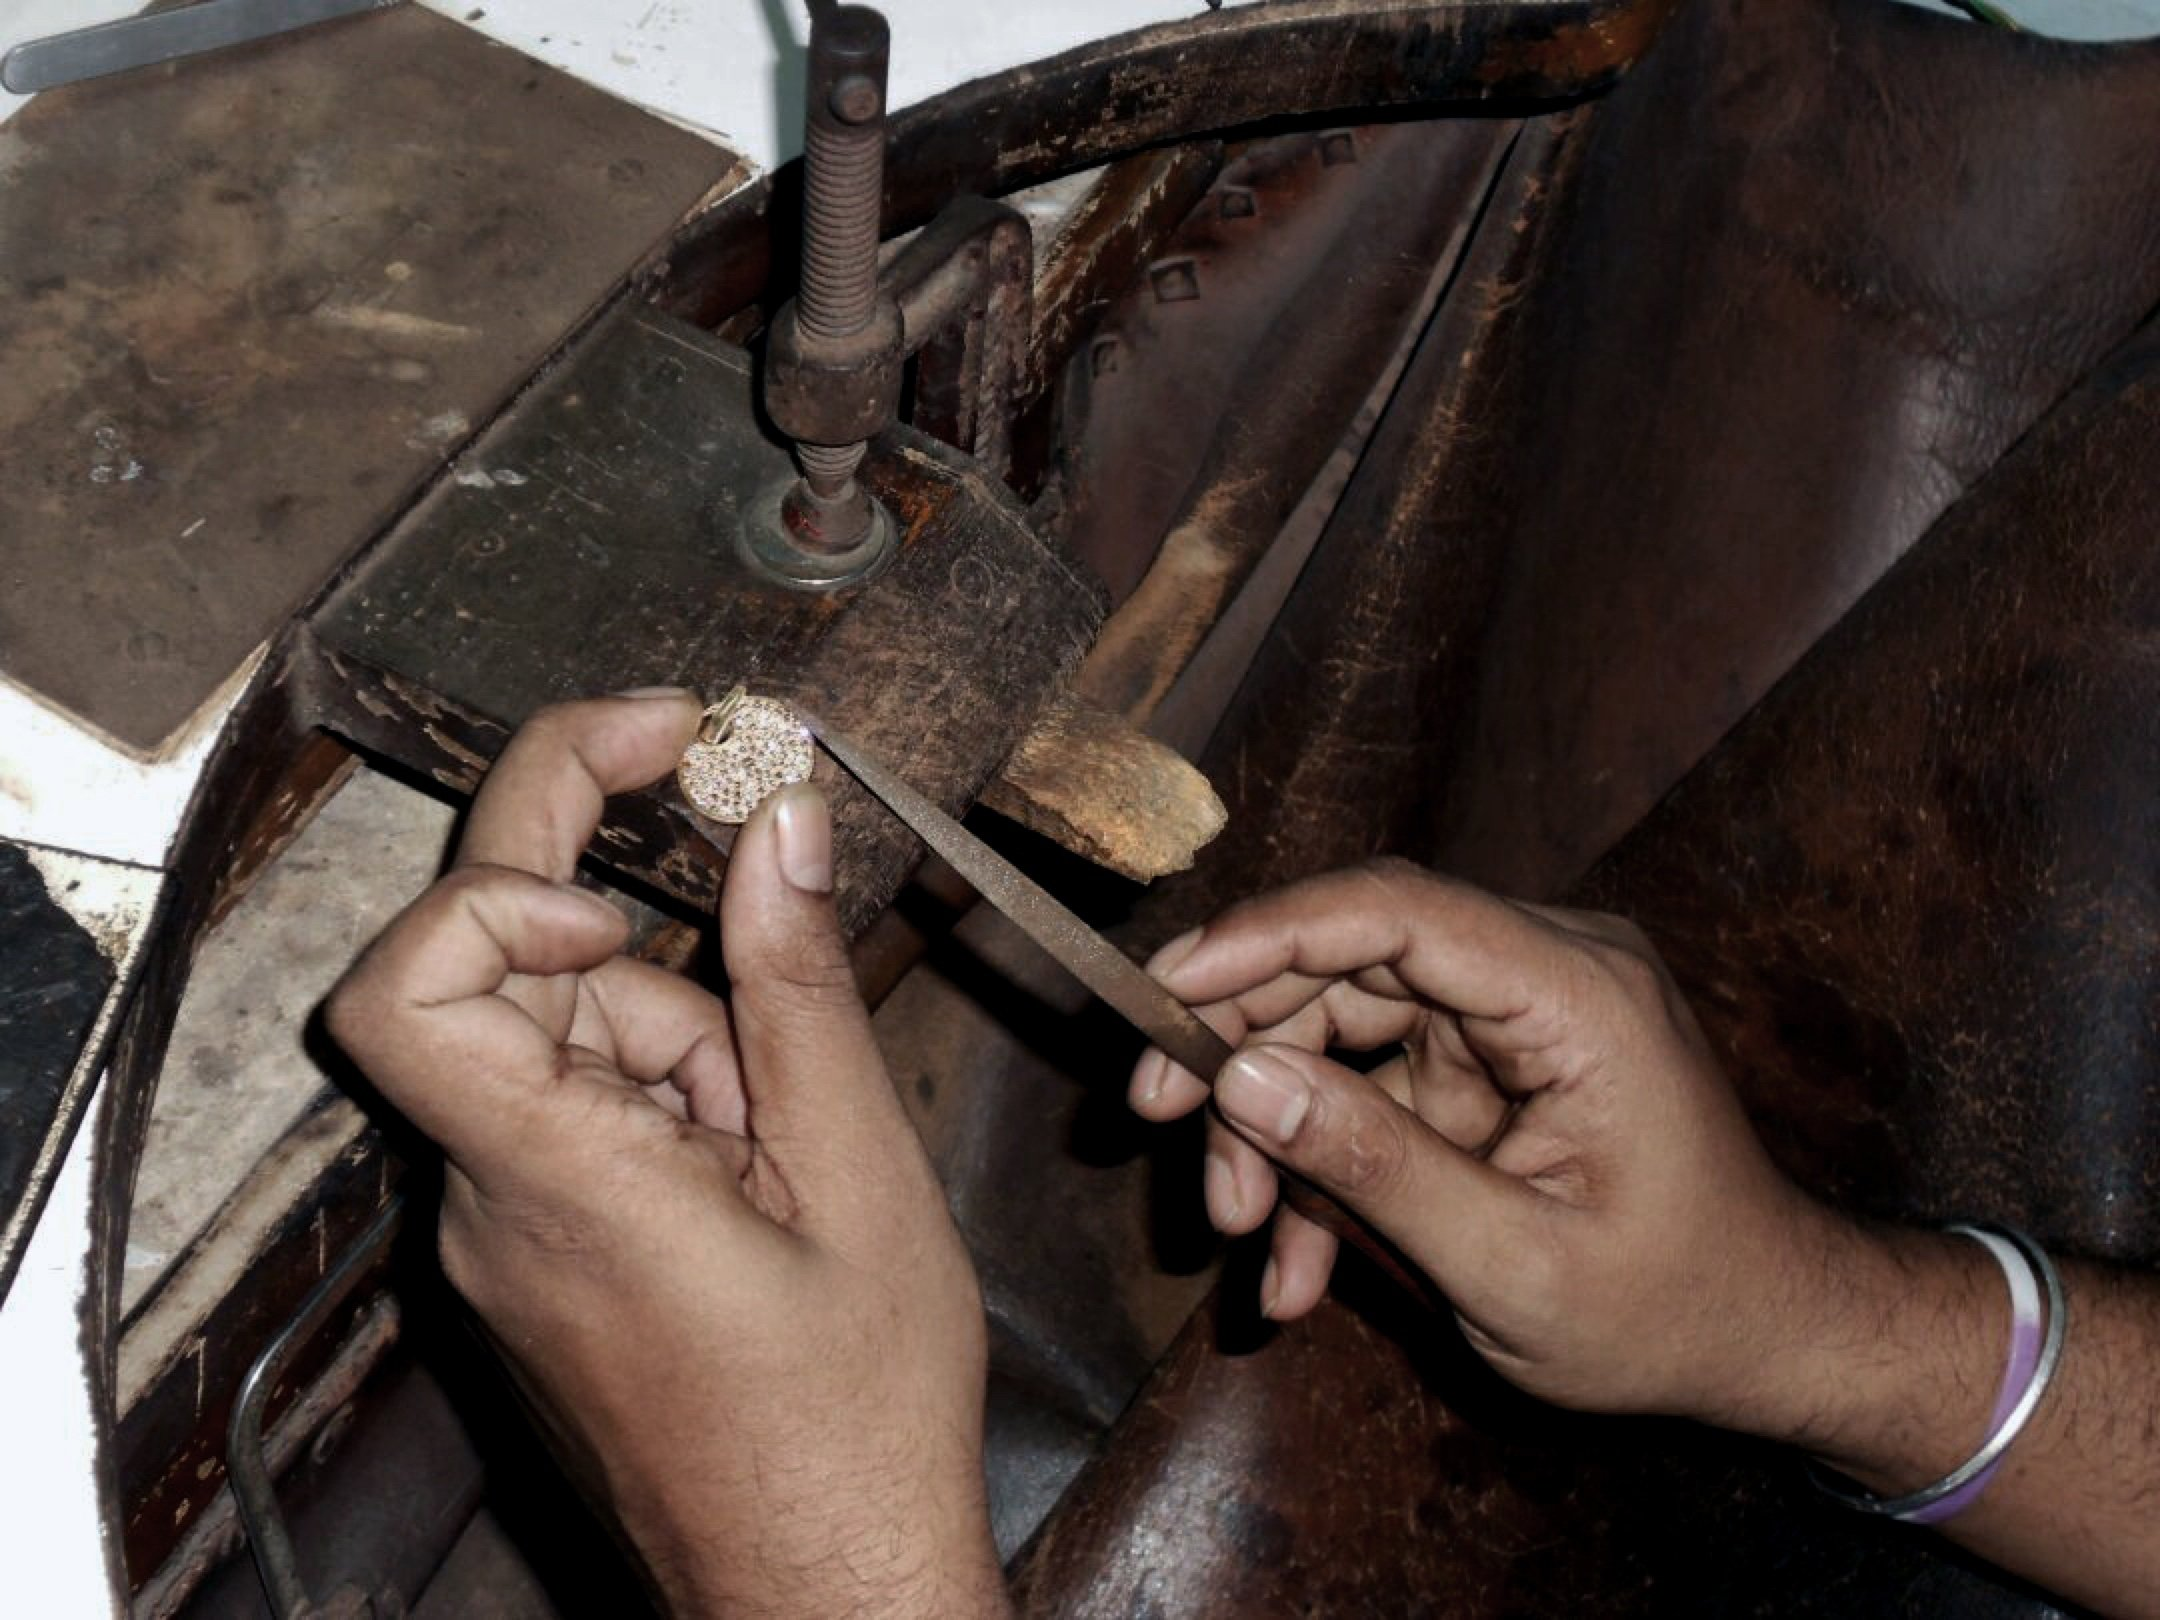 Custom Fine Jewelry Hand-Wrought By Expert Craftsmen